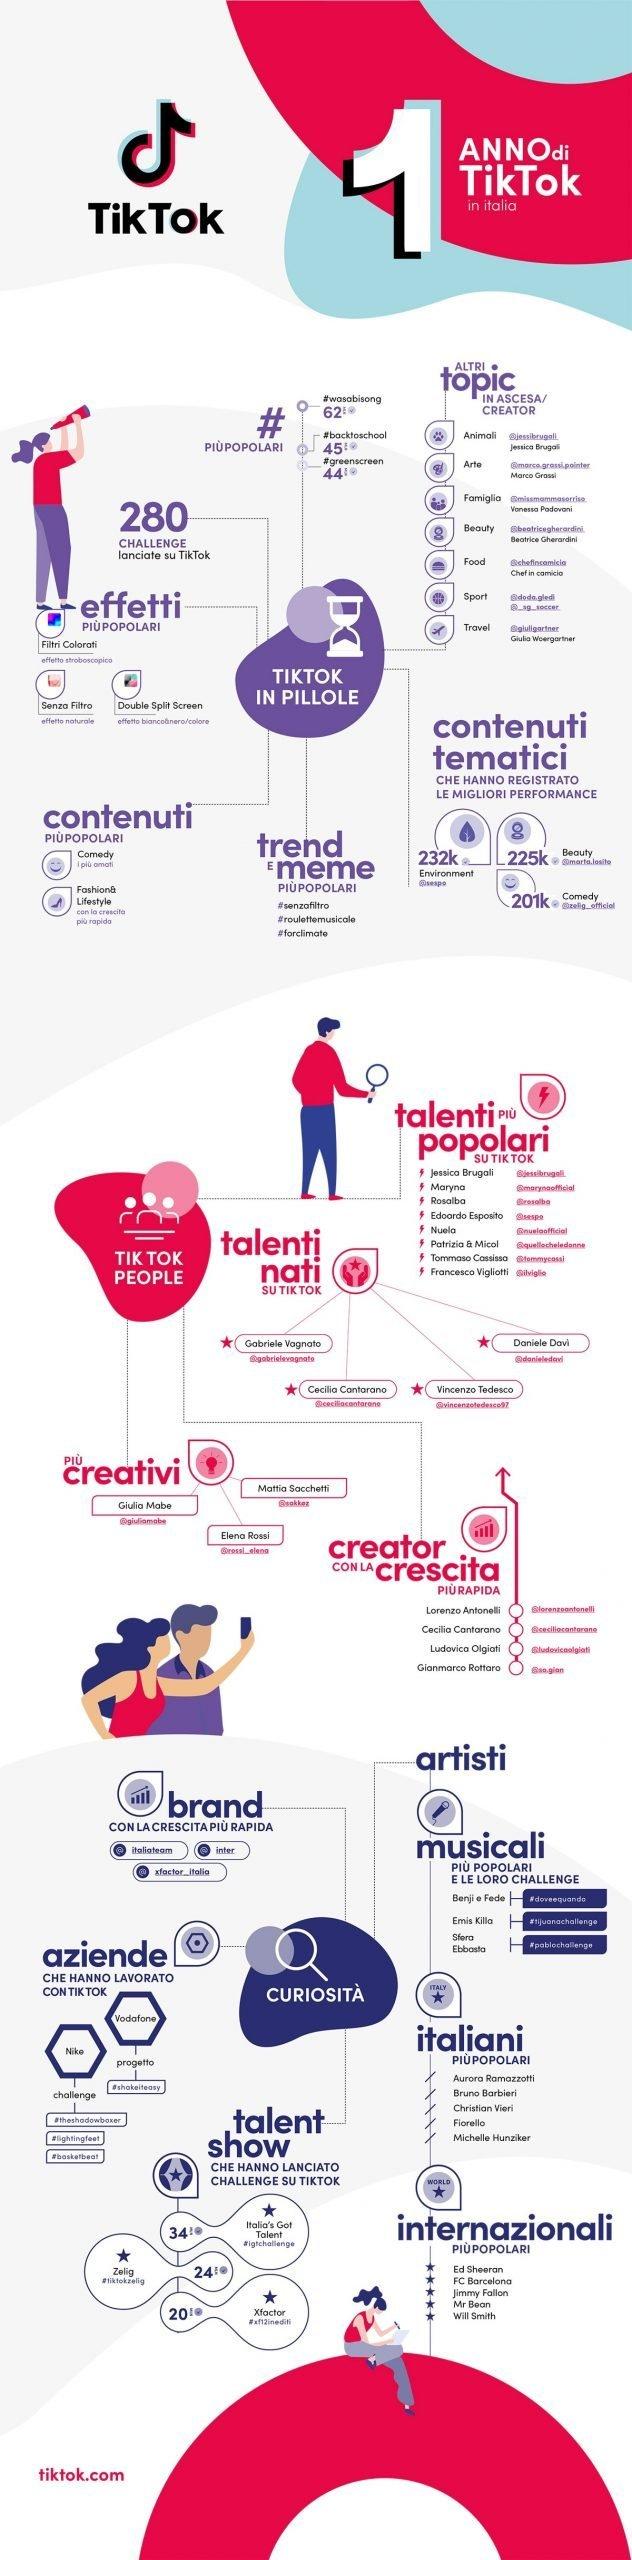 tiktok-infografica